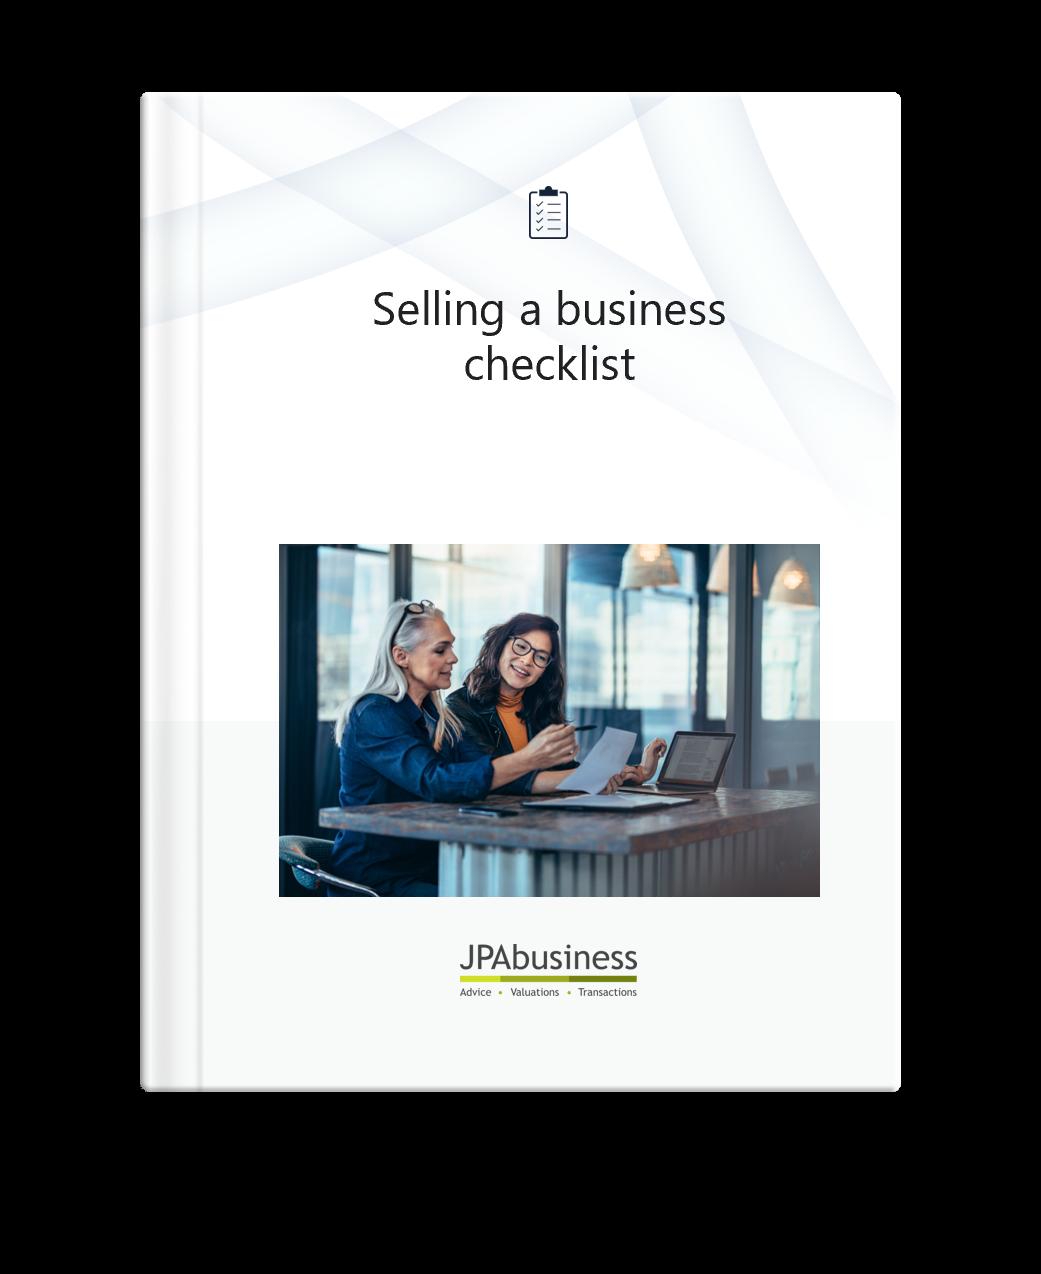 Selling_a_business_checklist_JPAbusiness